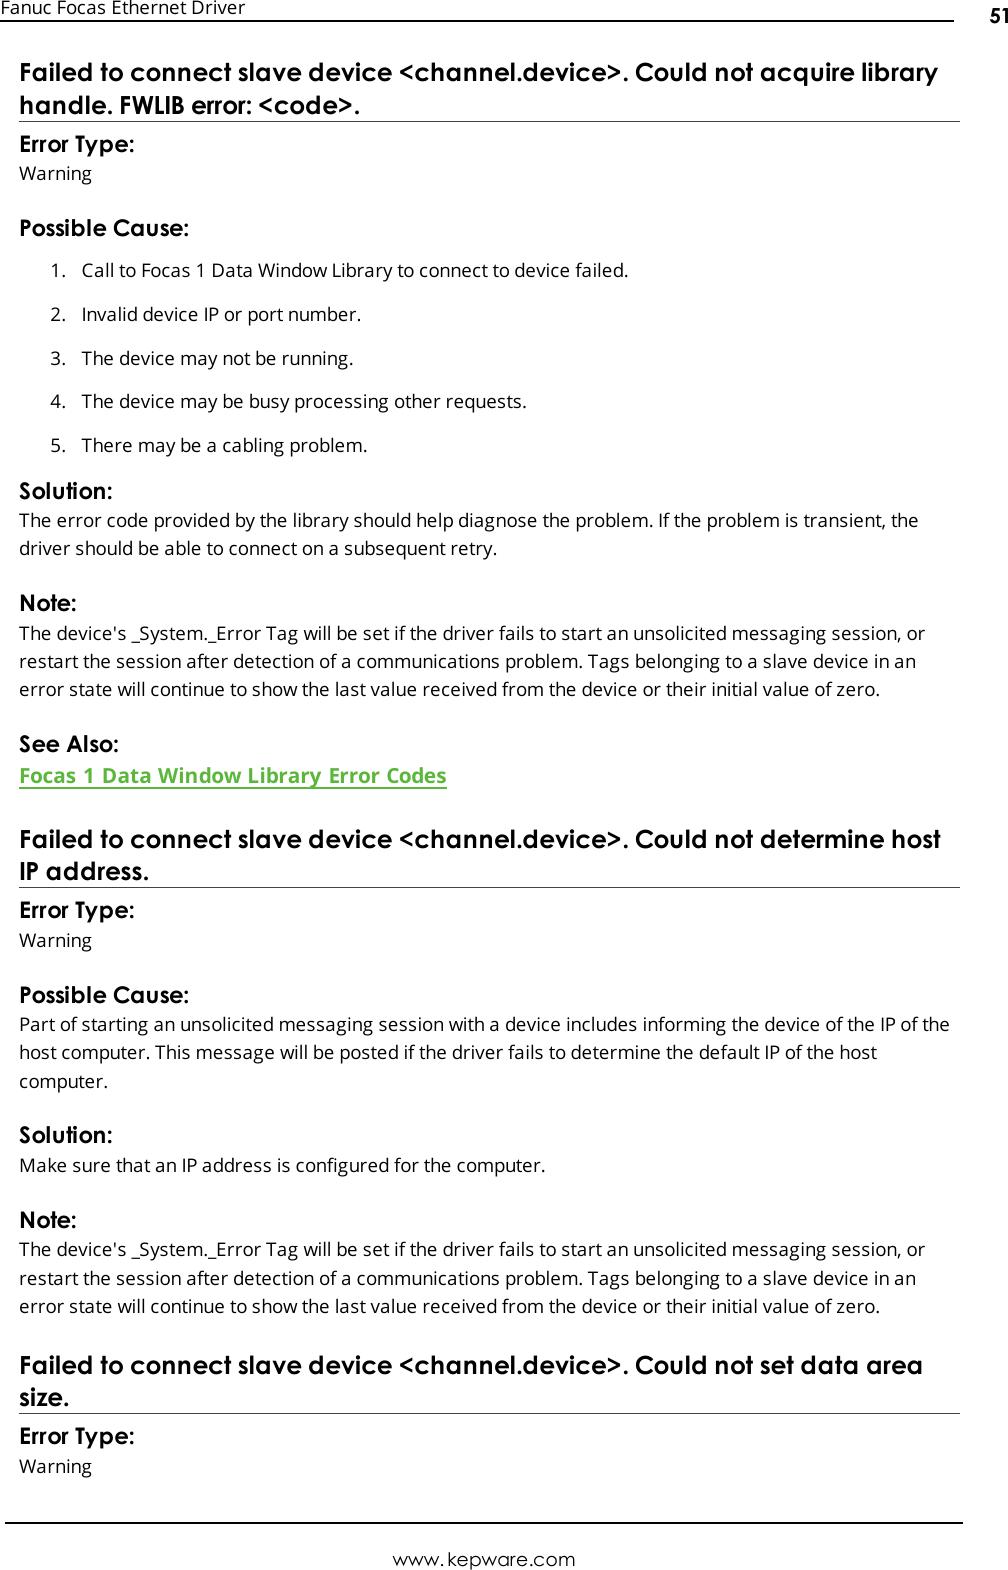 Fanuc Focas Ethernet Driver Help Manual